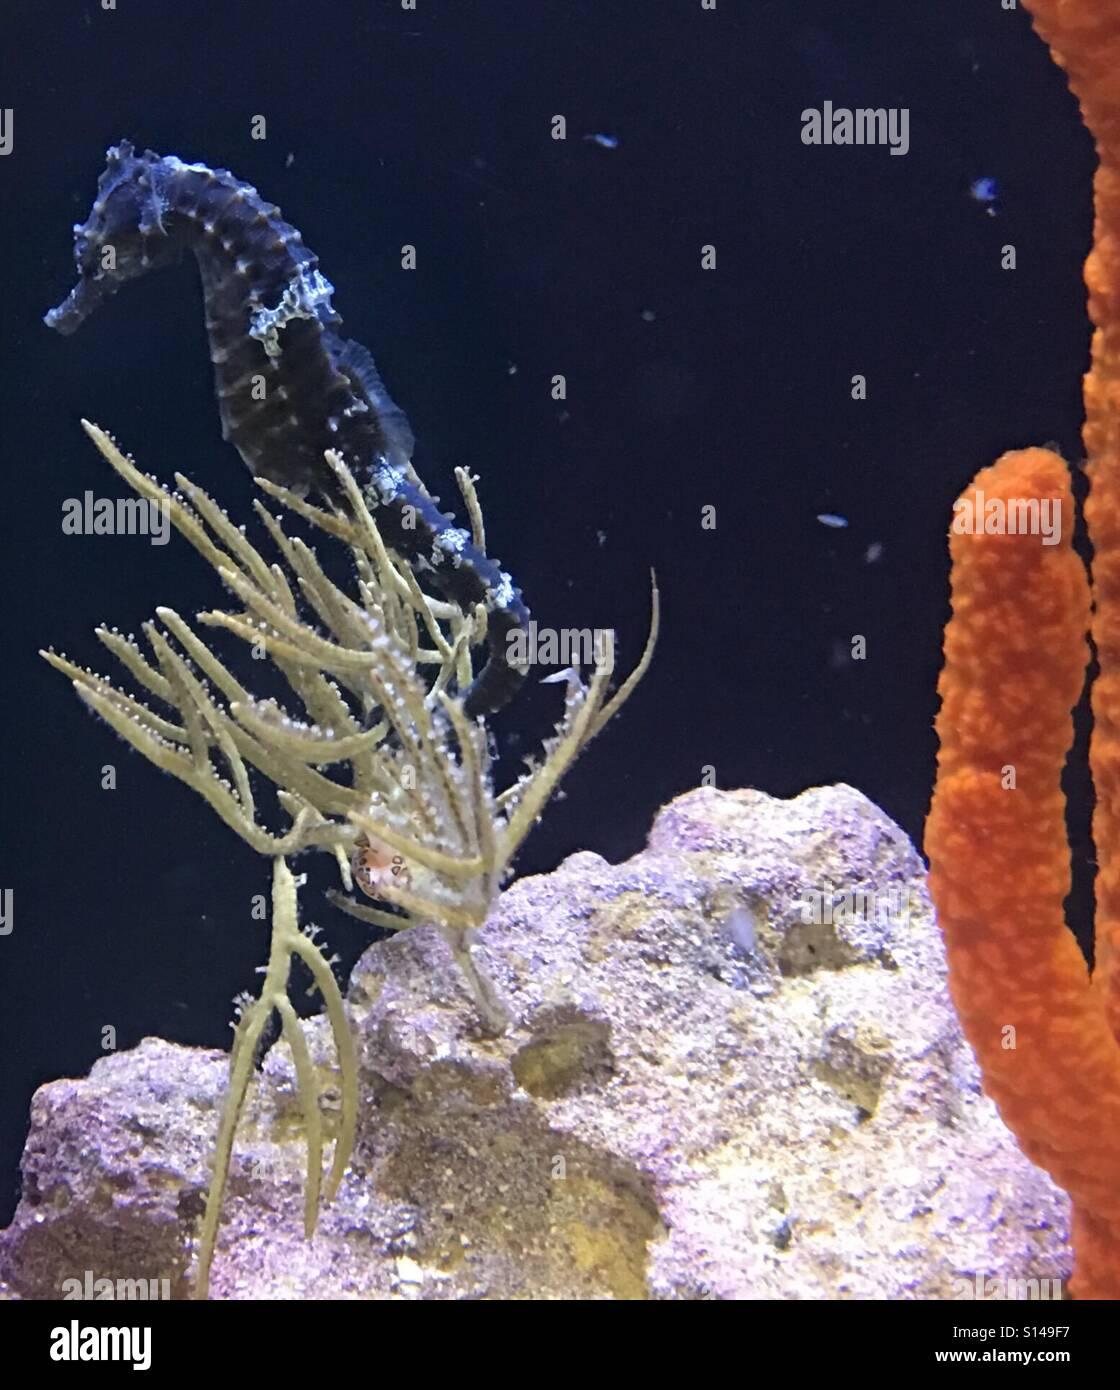 Seahorse - Stock Image